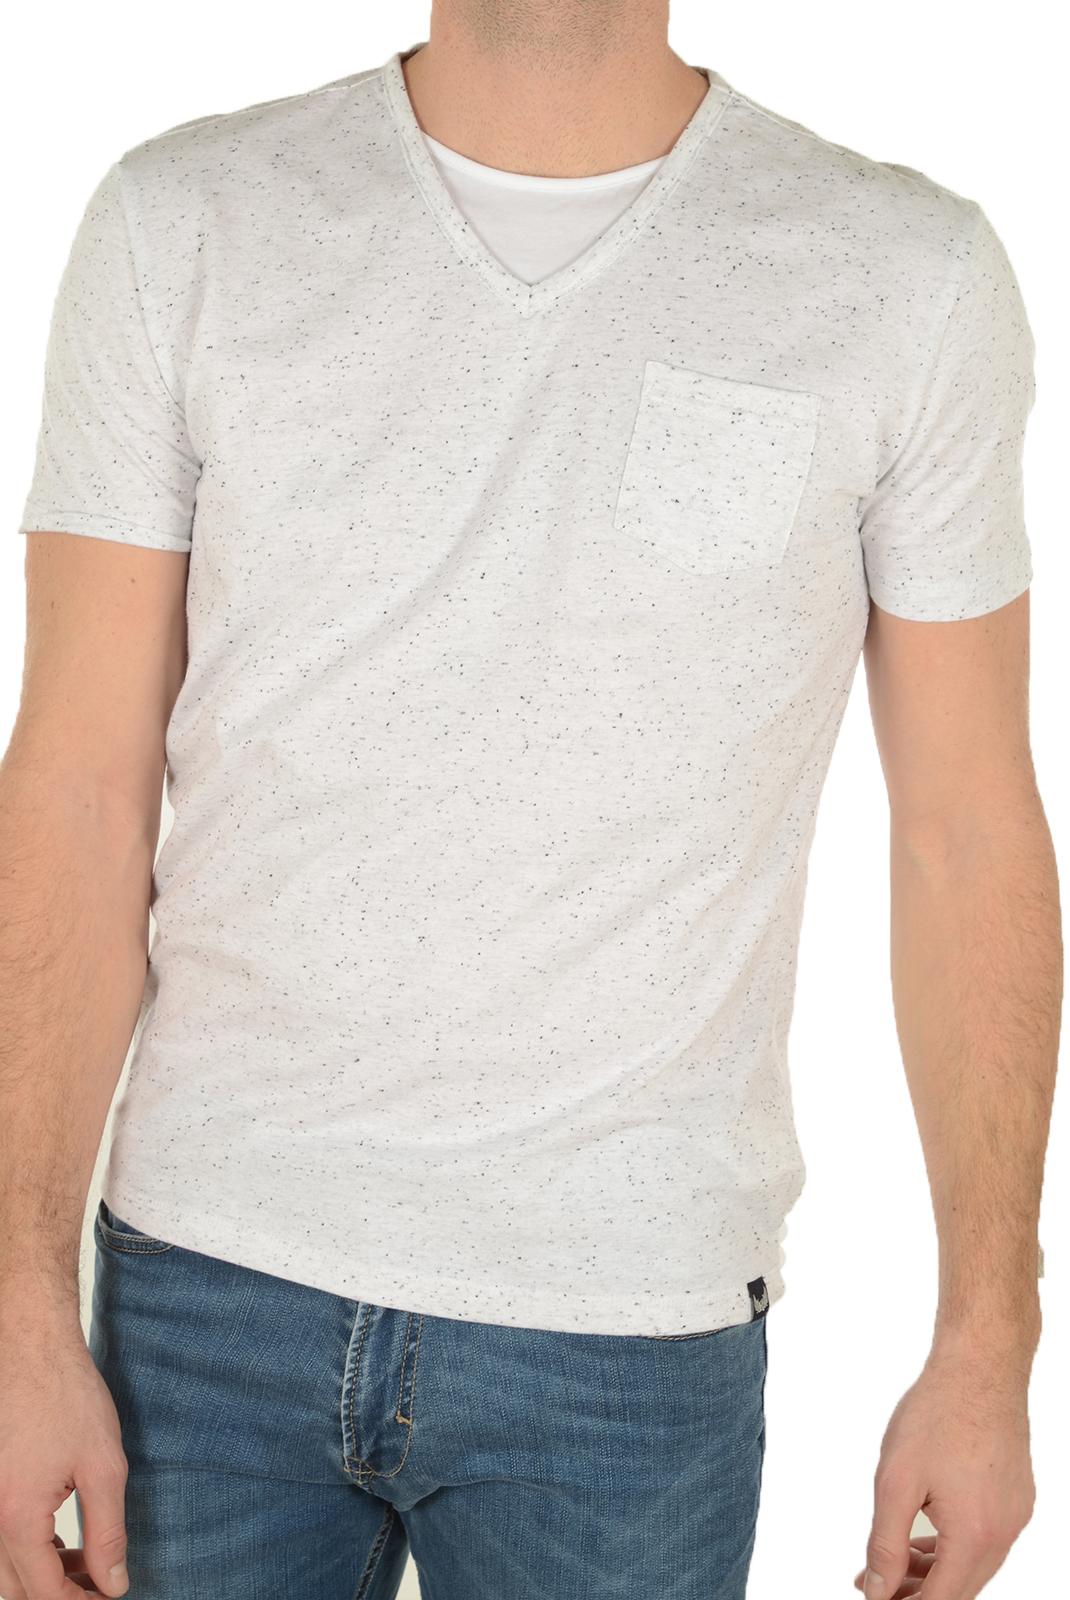 Tee-shirts  Kaporal CIAO WHITE